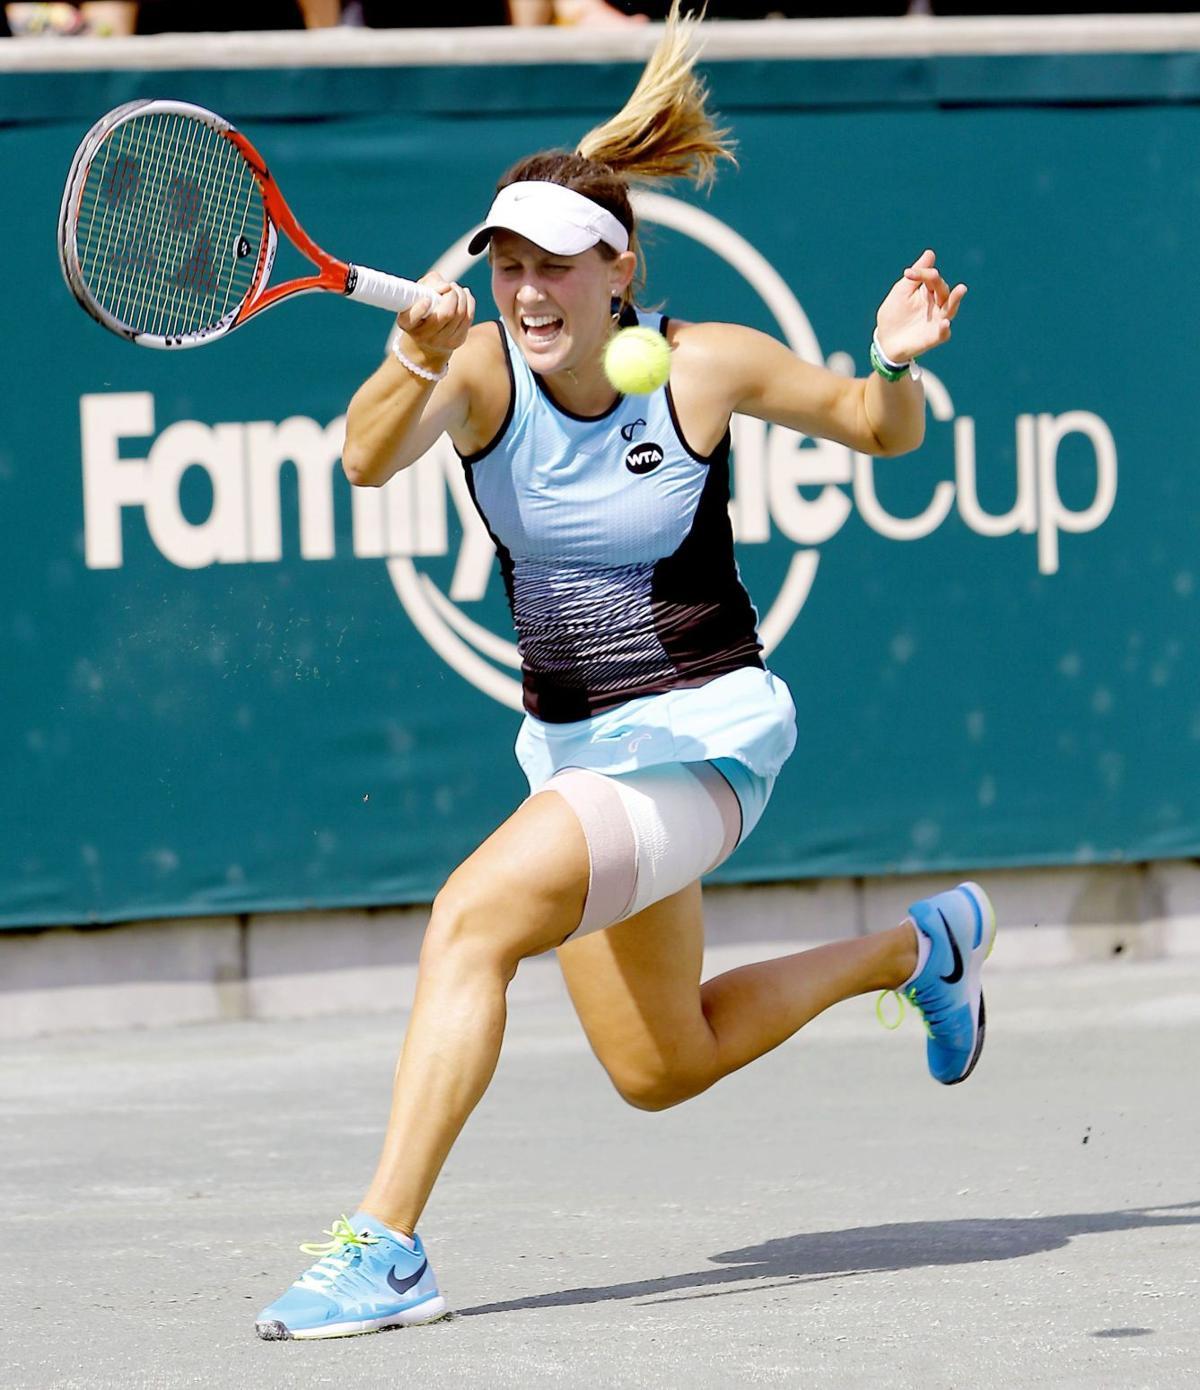 Dunlop Junior Tennis Championship begins Friday (copy)